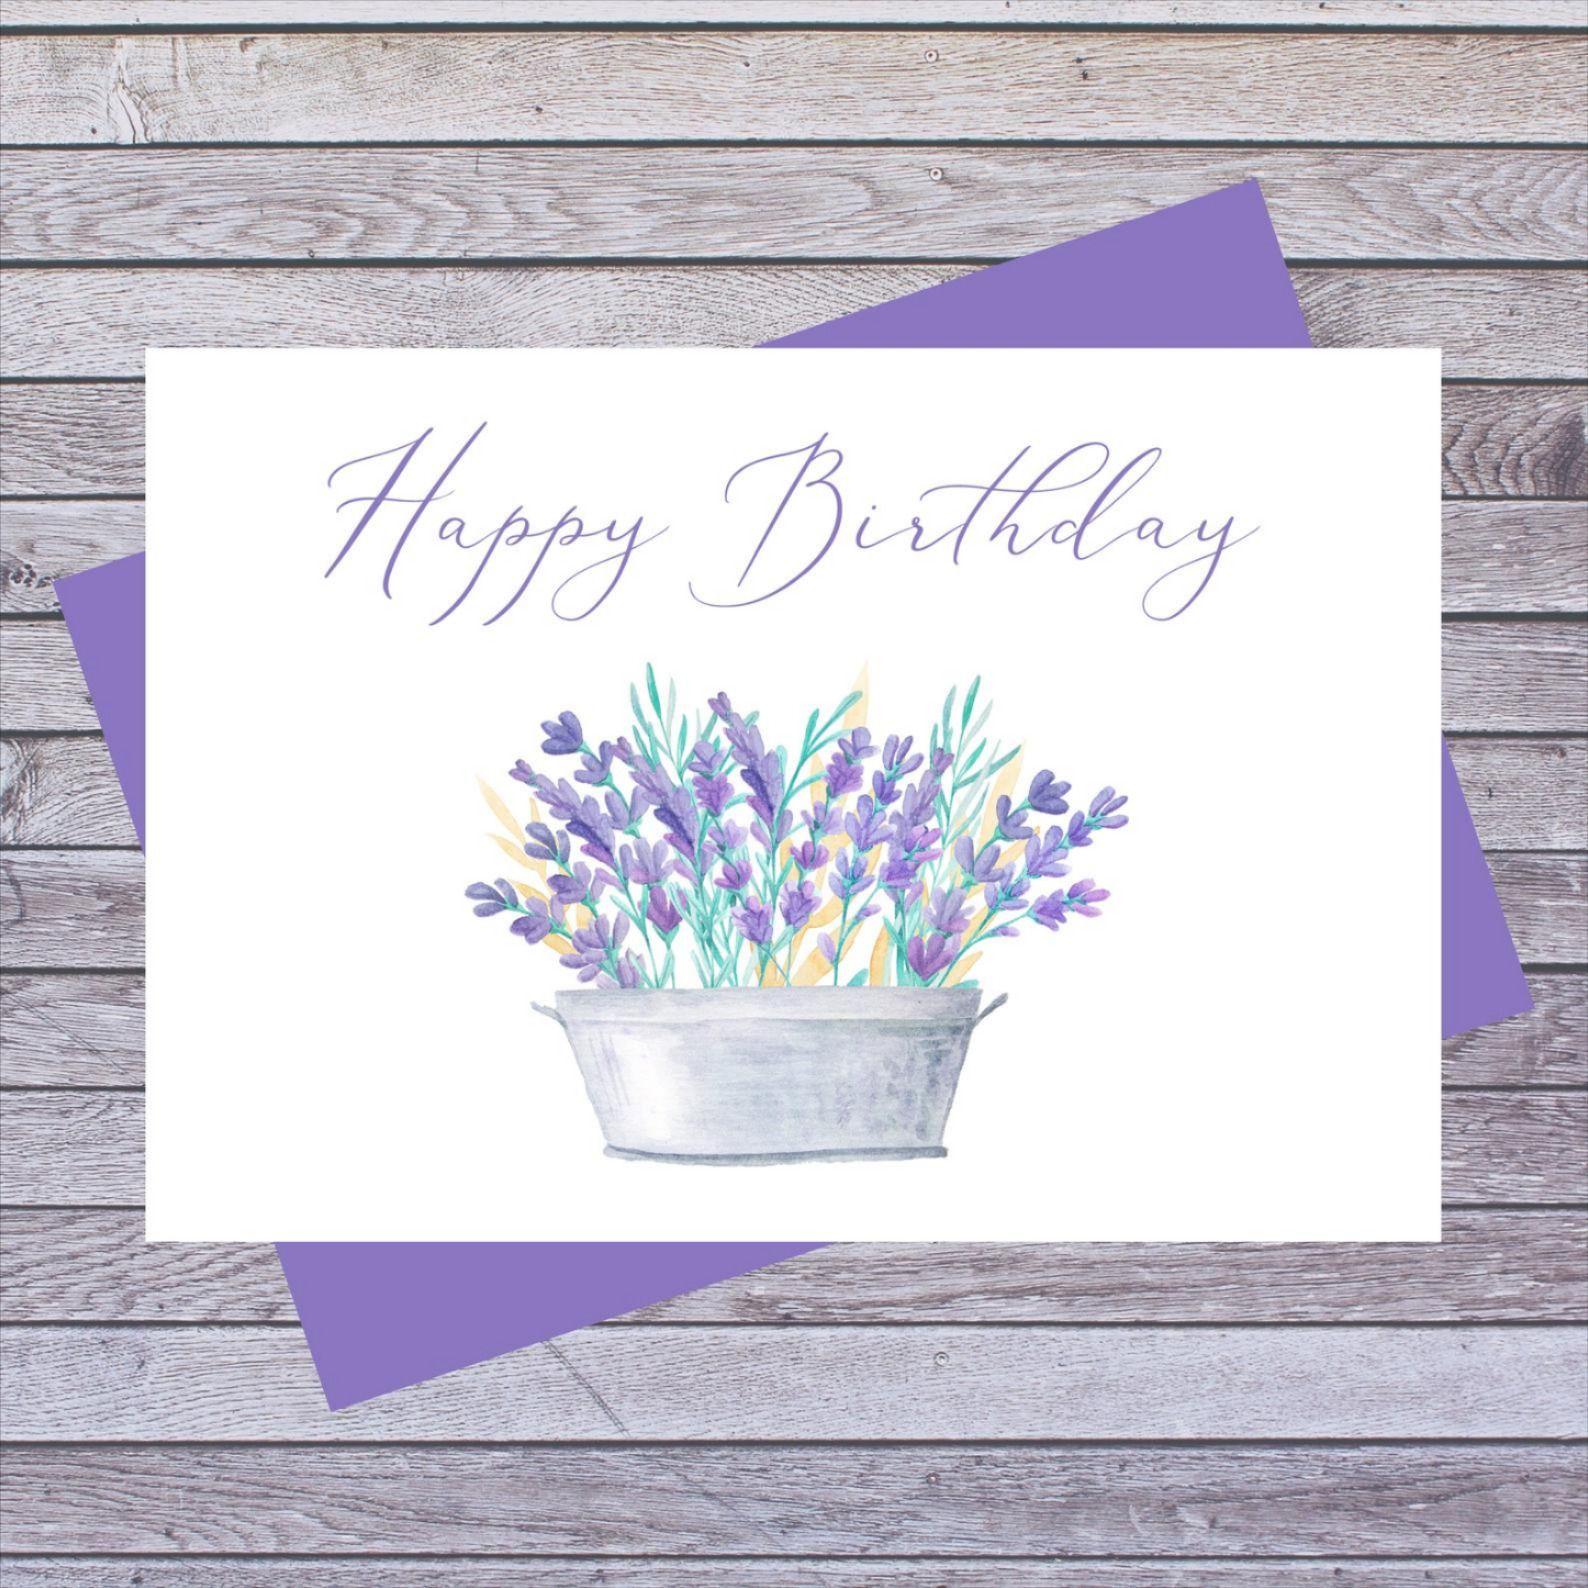 Free Printable Happy Birthday Confetti Greeting Card Happy Birthday Sms Happy Birthday Cards Printable Happy Birthday Cards Images